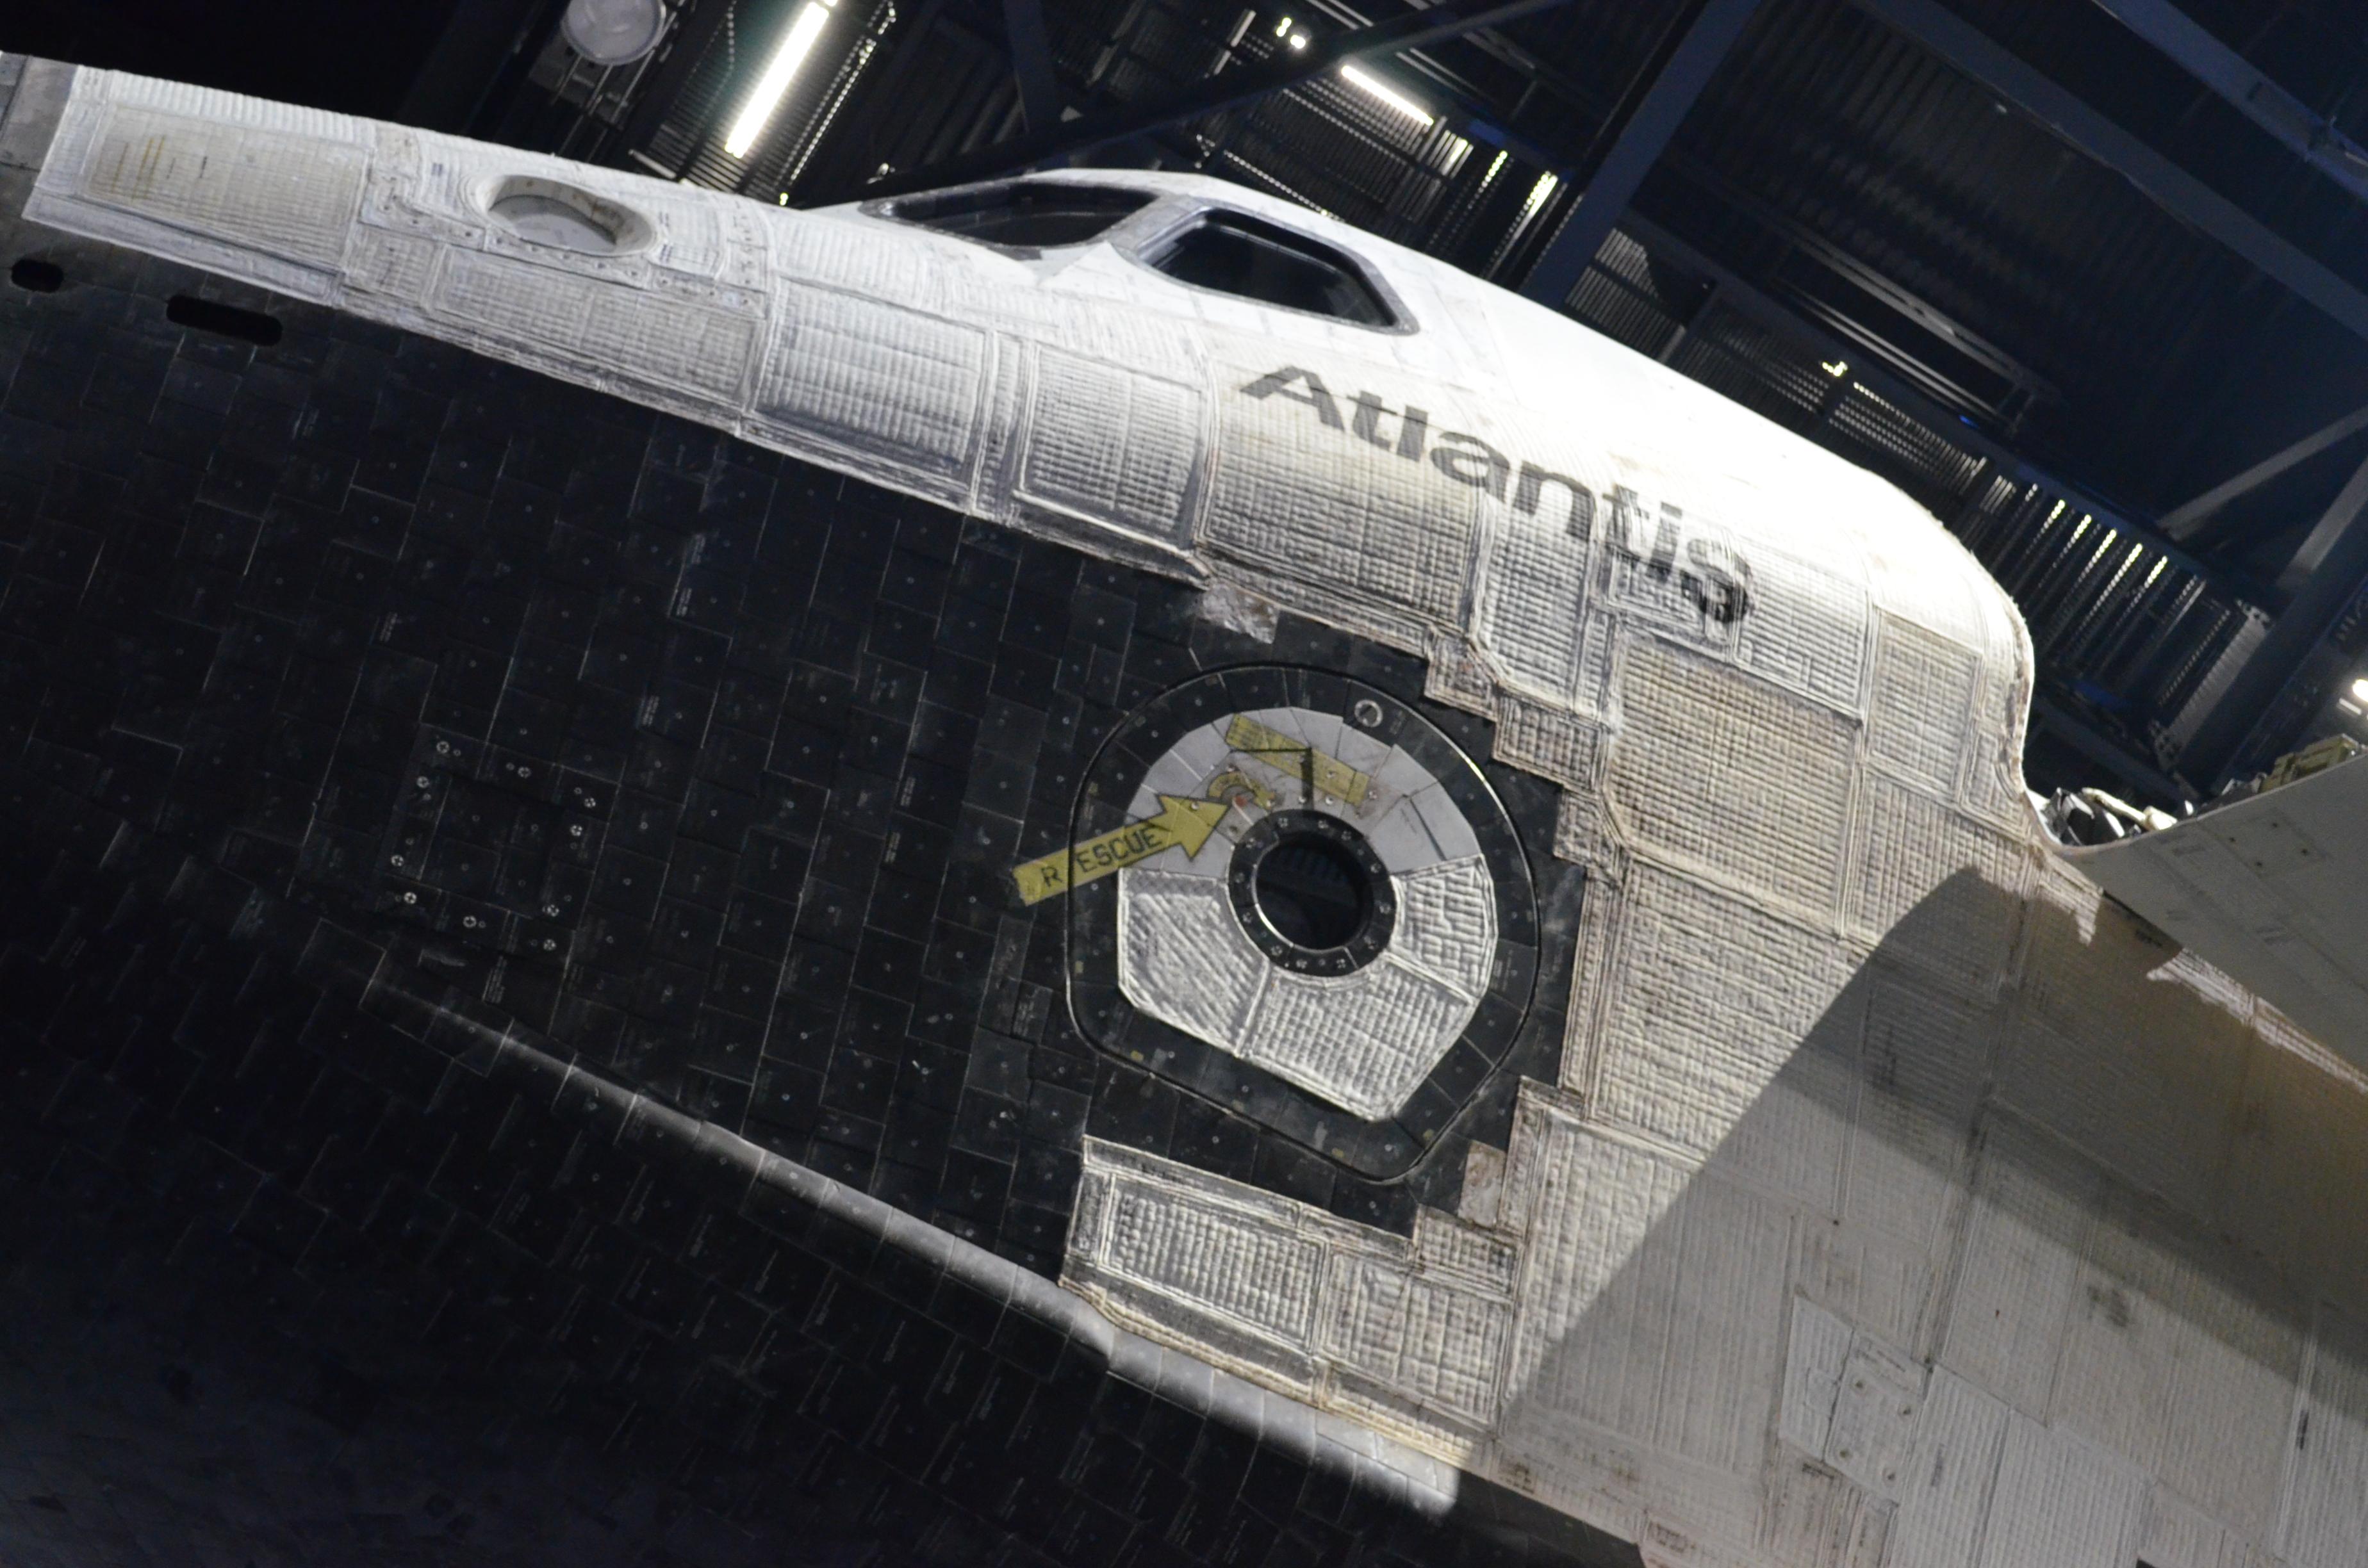 Shuttle Nose